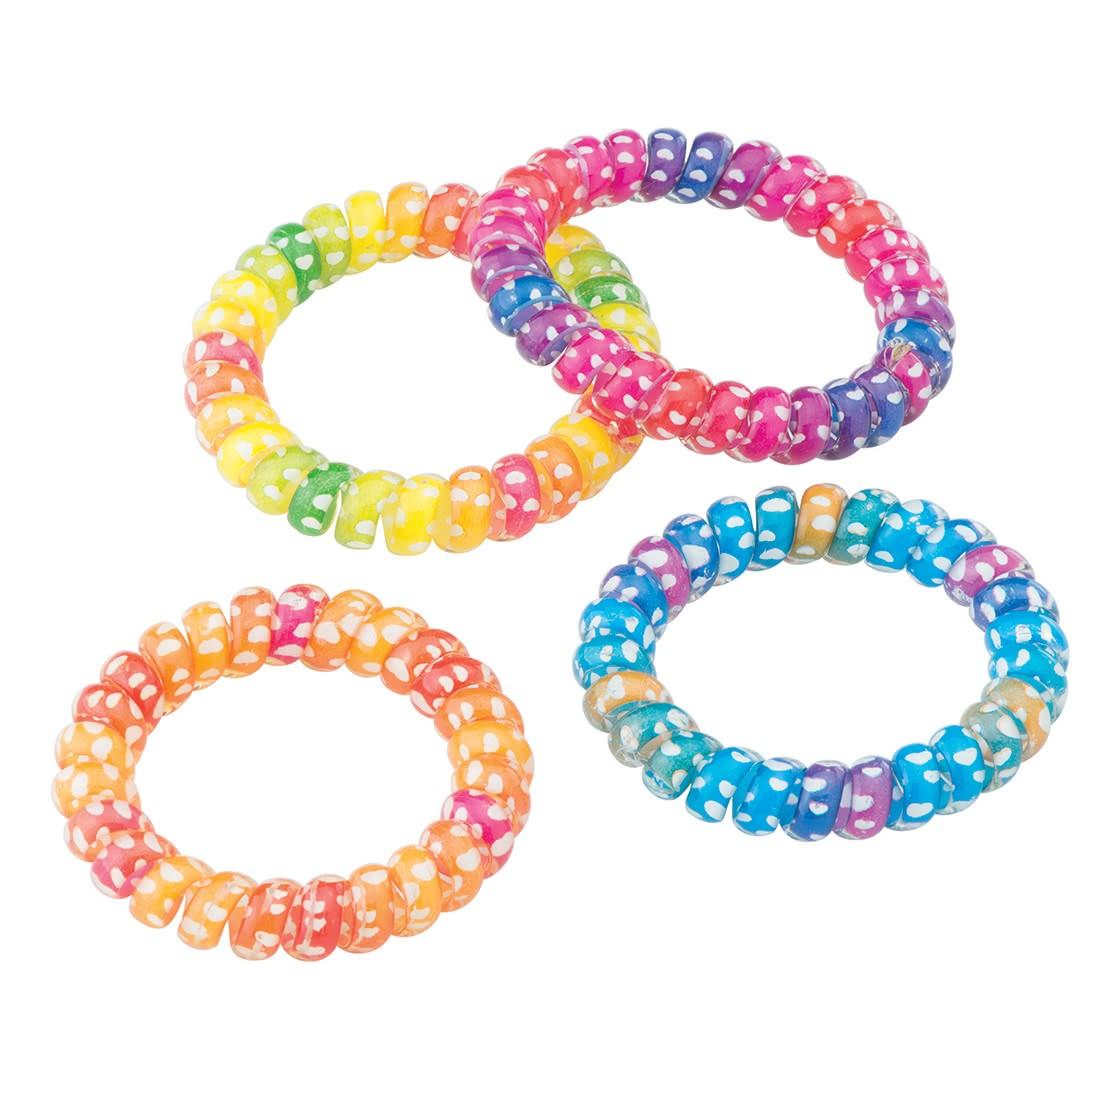 Rainbow Fun Cord Bracelets   [image]